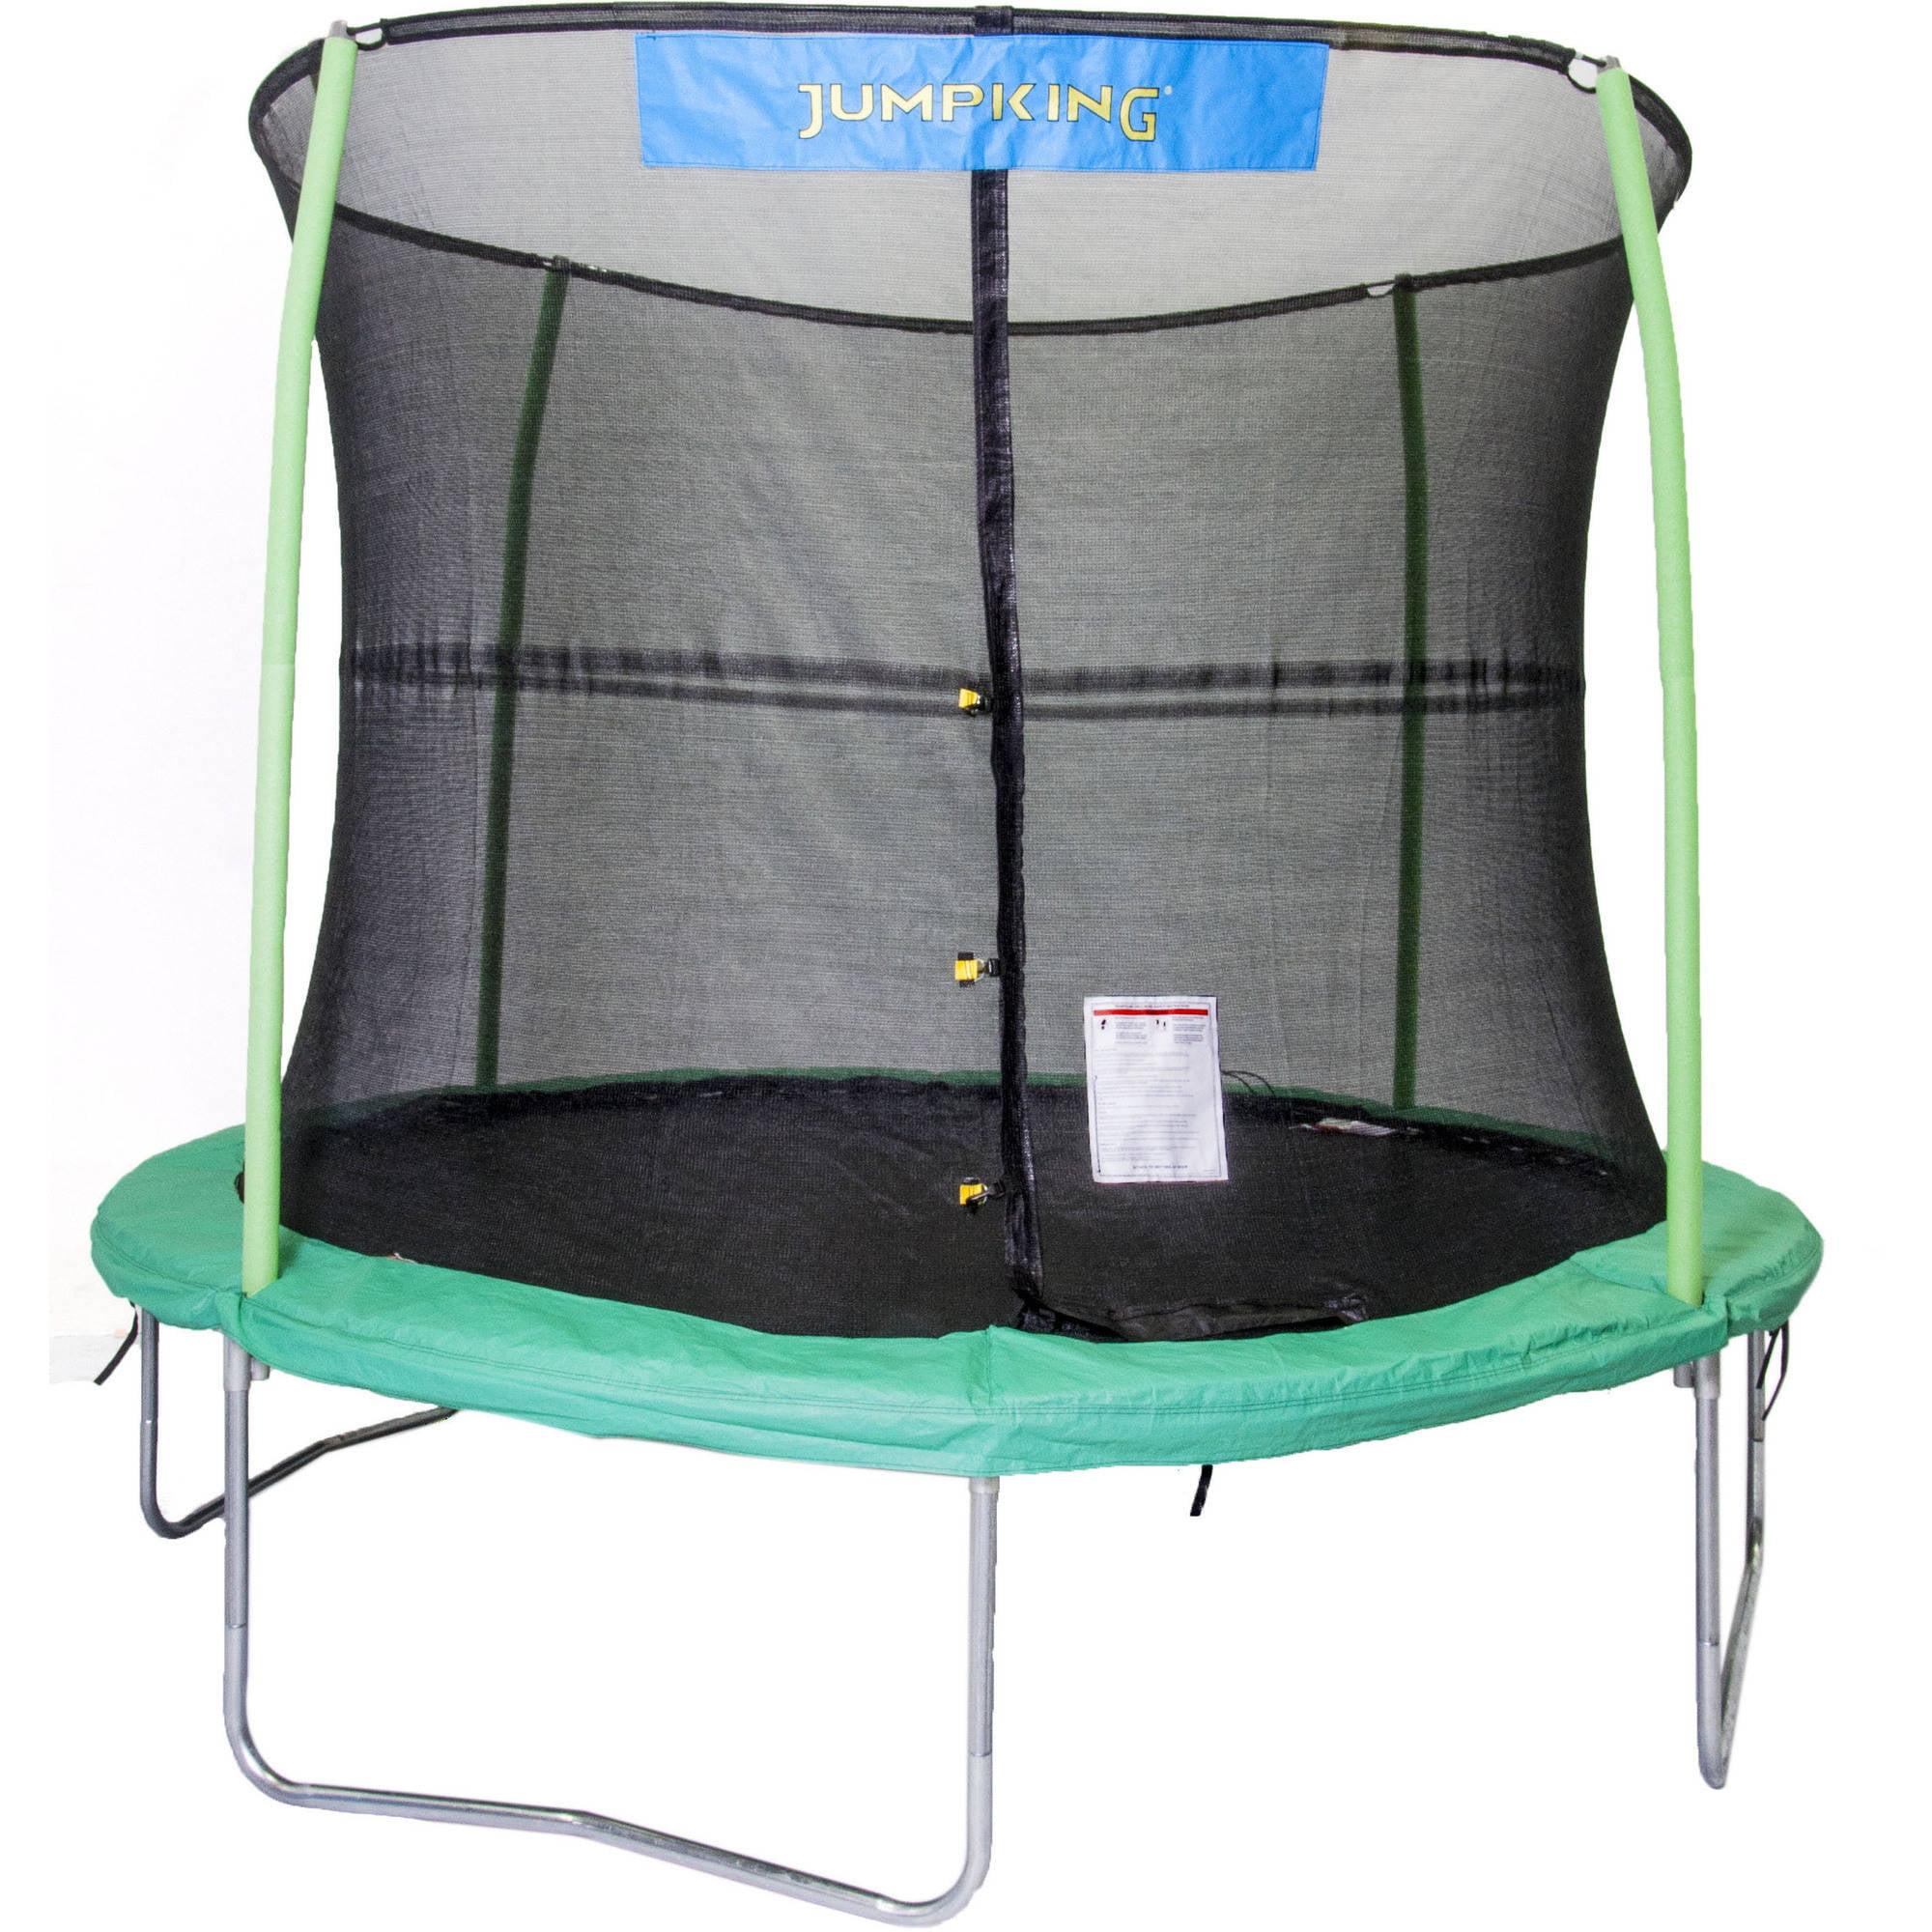 Jumpking 10 Trampoline And Enclosure